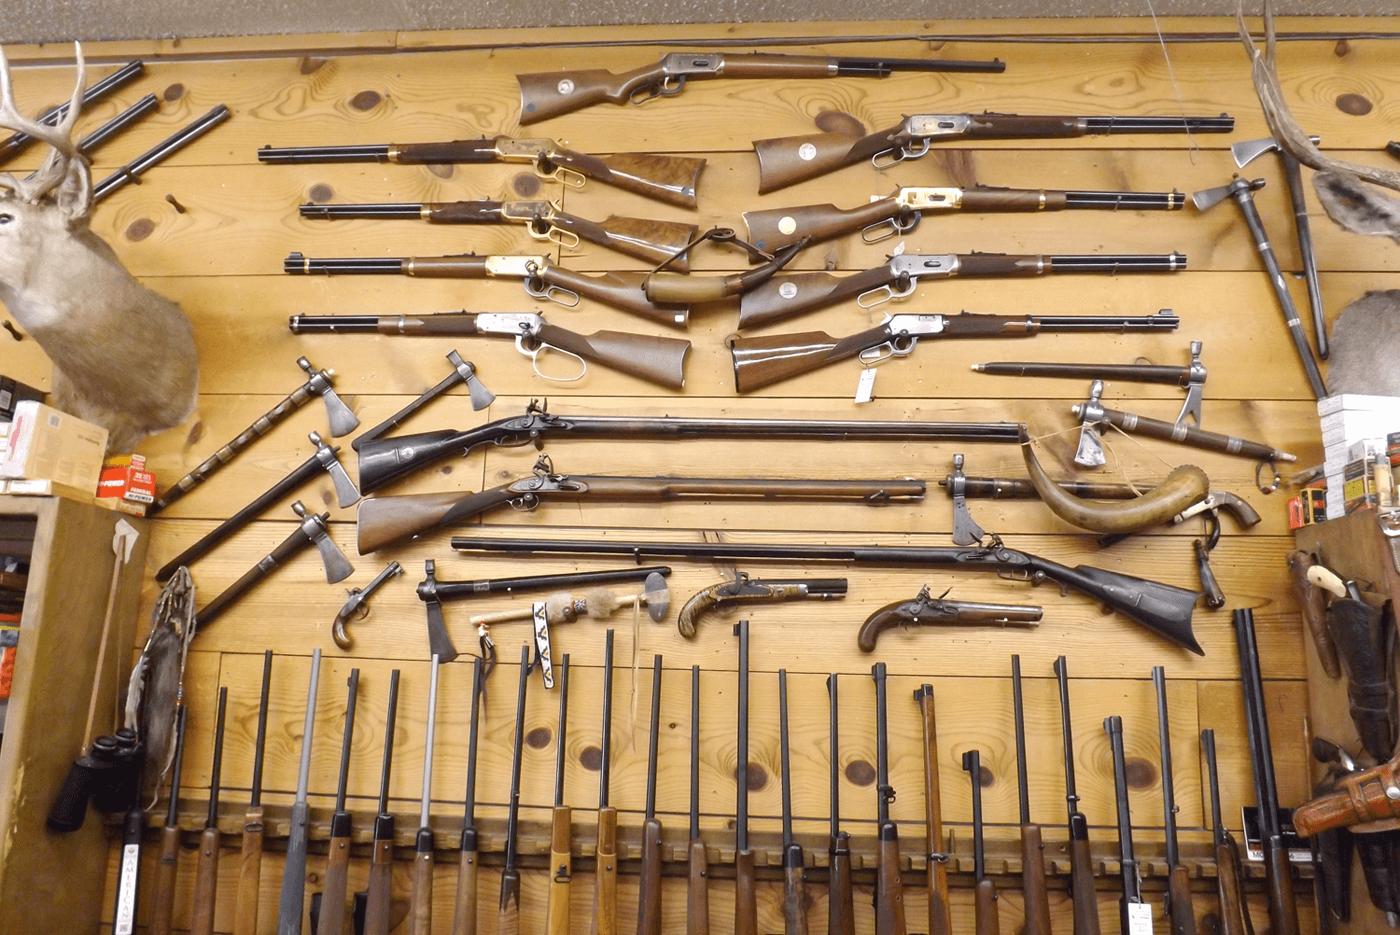 Buy and Sell Guns-Enumclaw - Enumclaw, WA - Tuttle's Gun Store